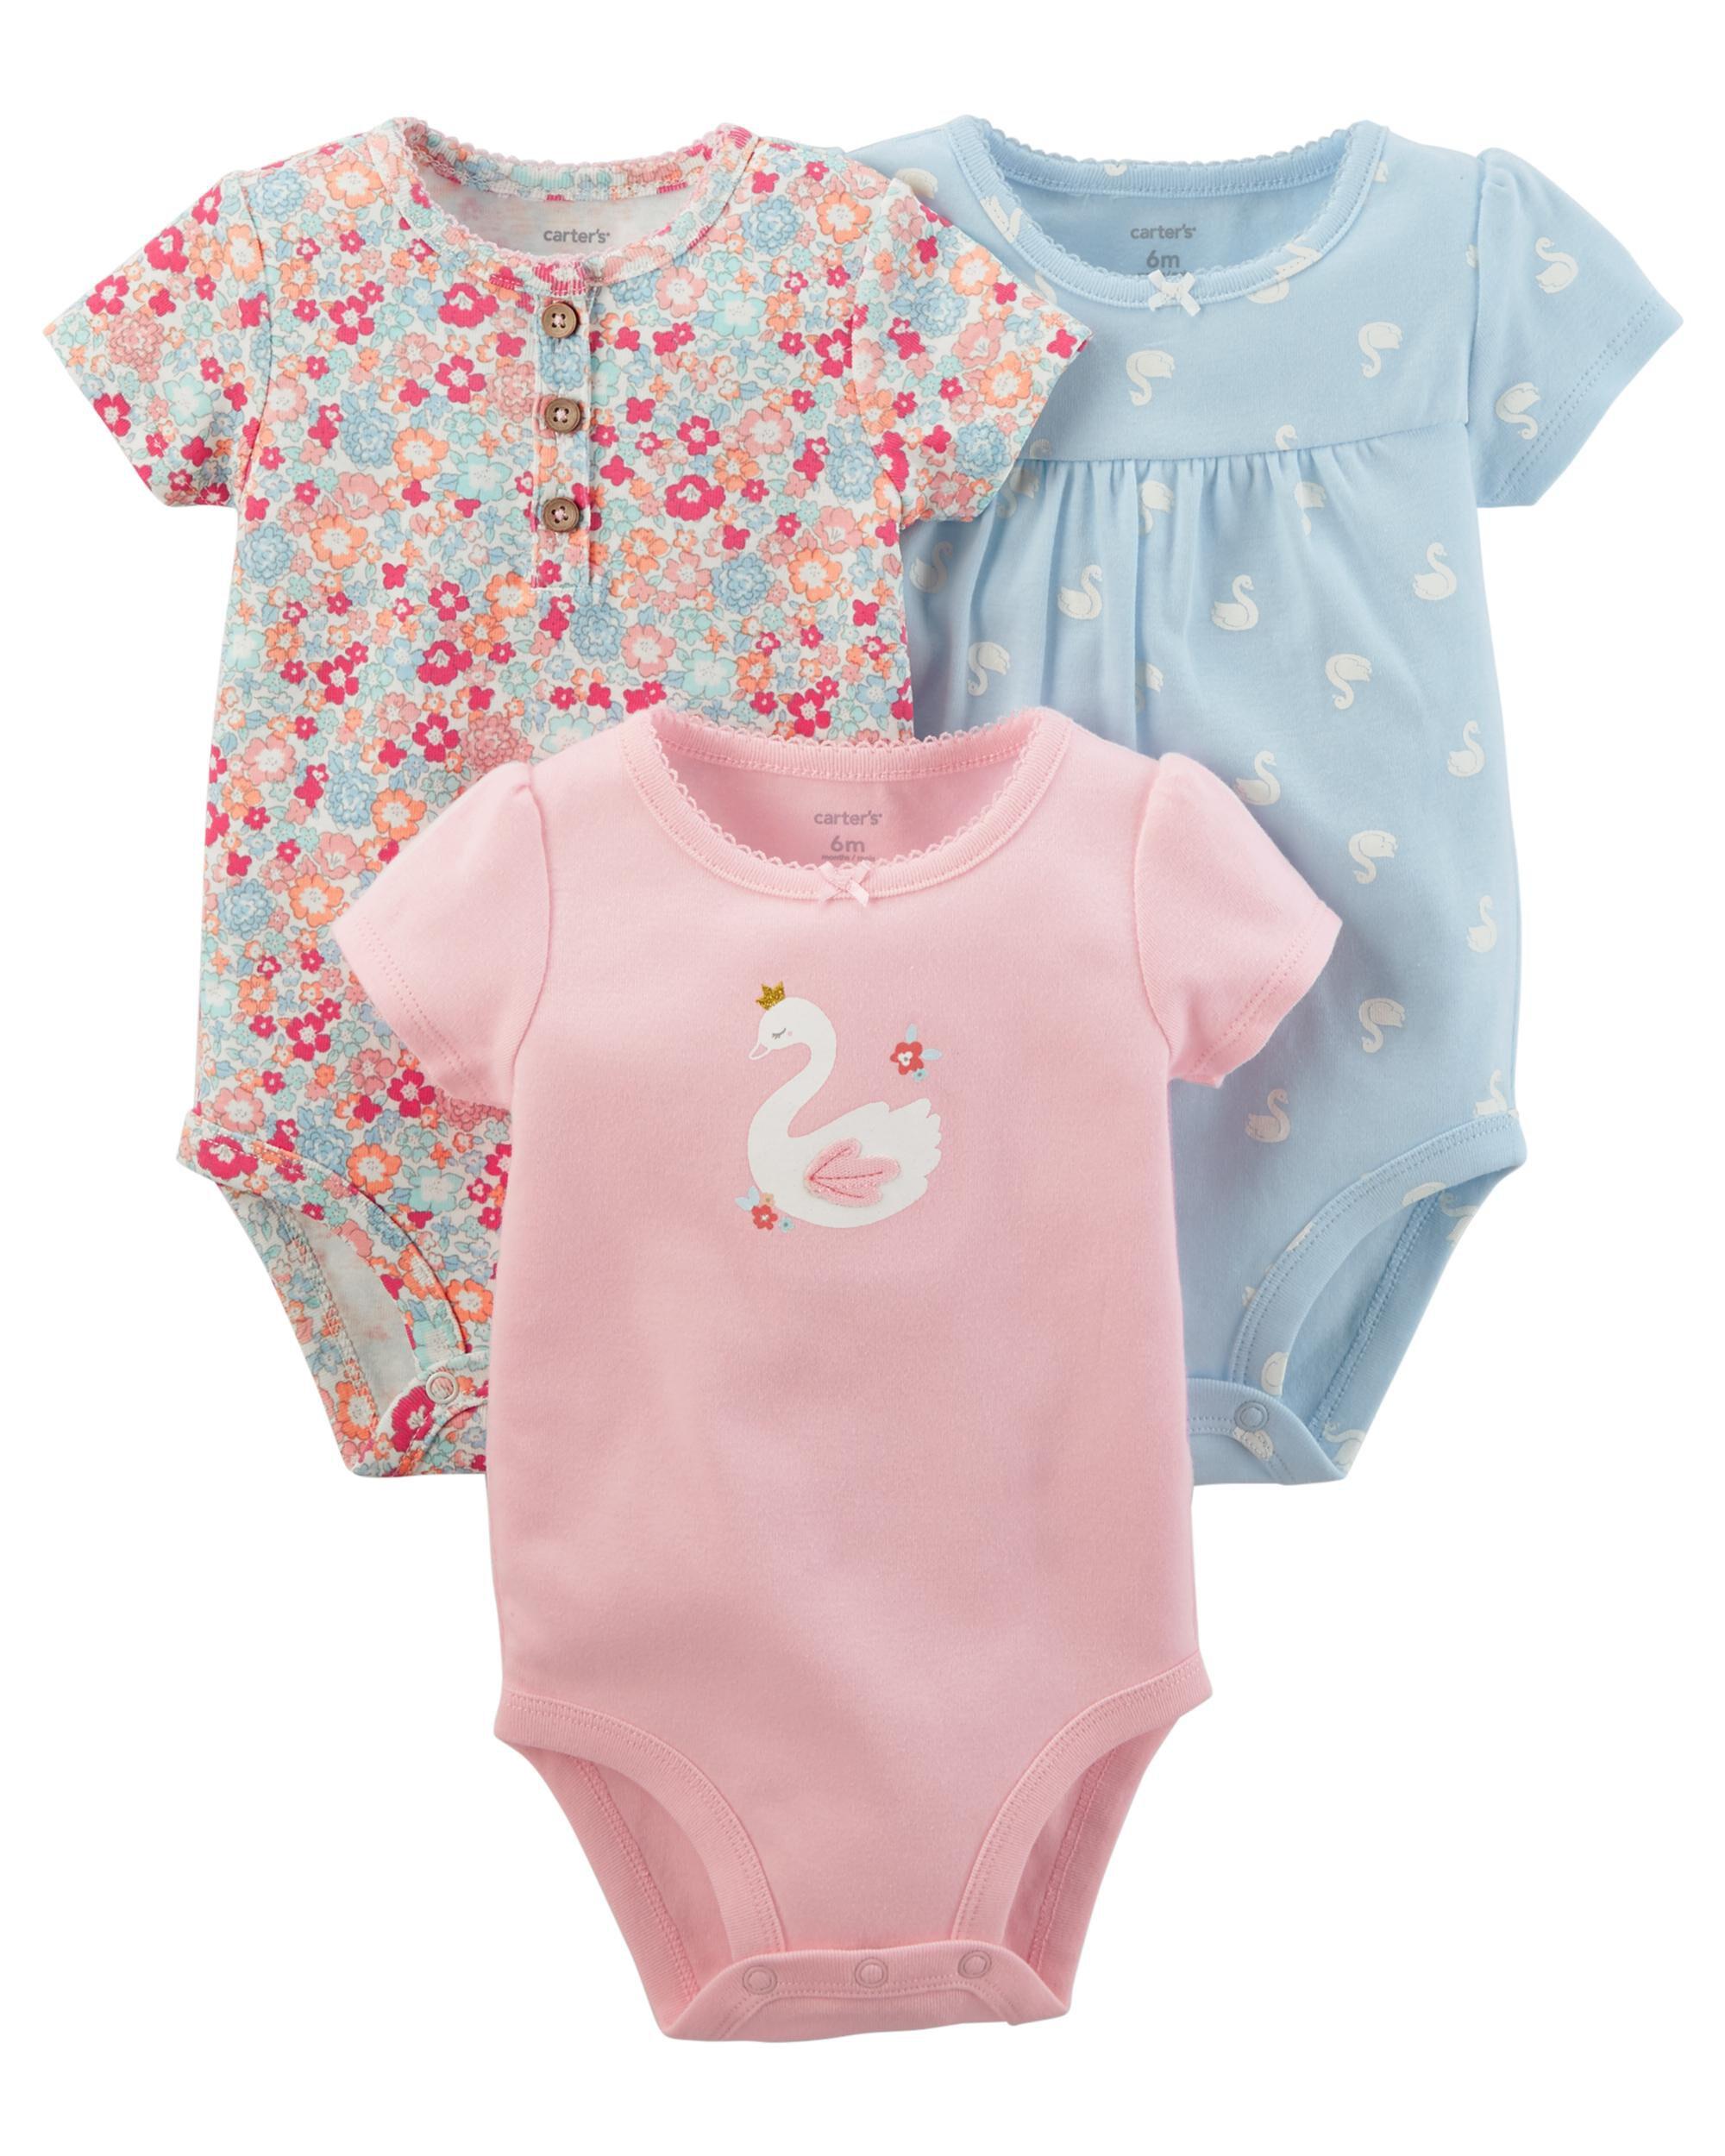 Boys' Clothing (newborn-5t) Lot Of 3 Boys Size 3 Shorts Oshkosh Carters Garanimals Online Discount Bottoms